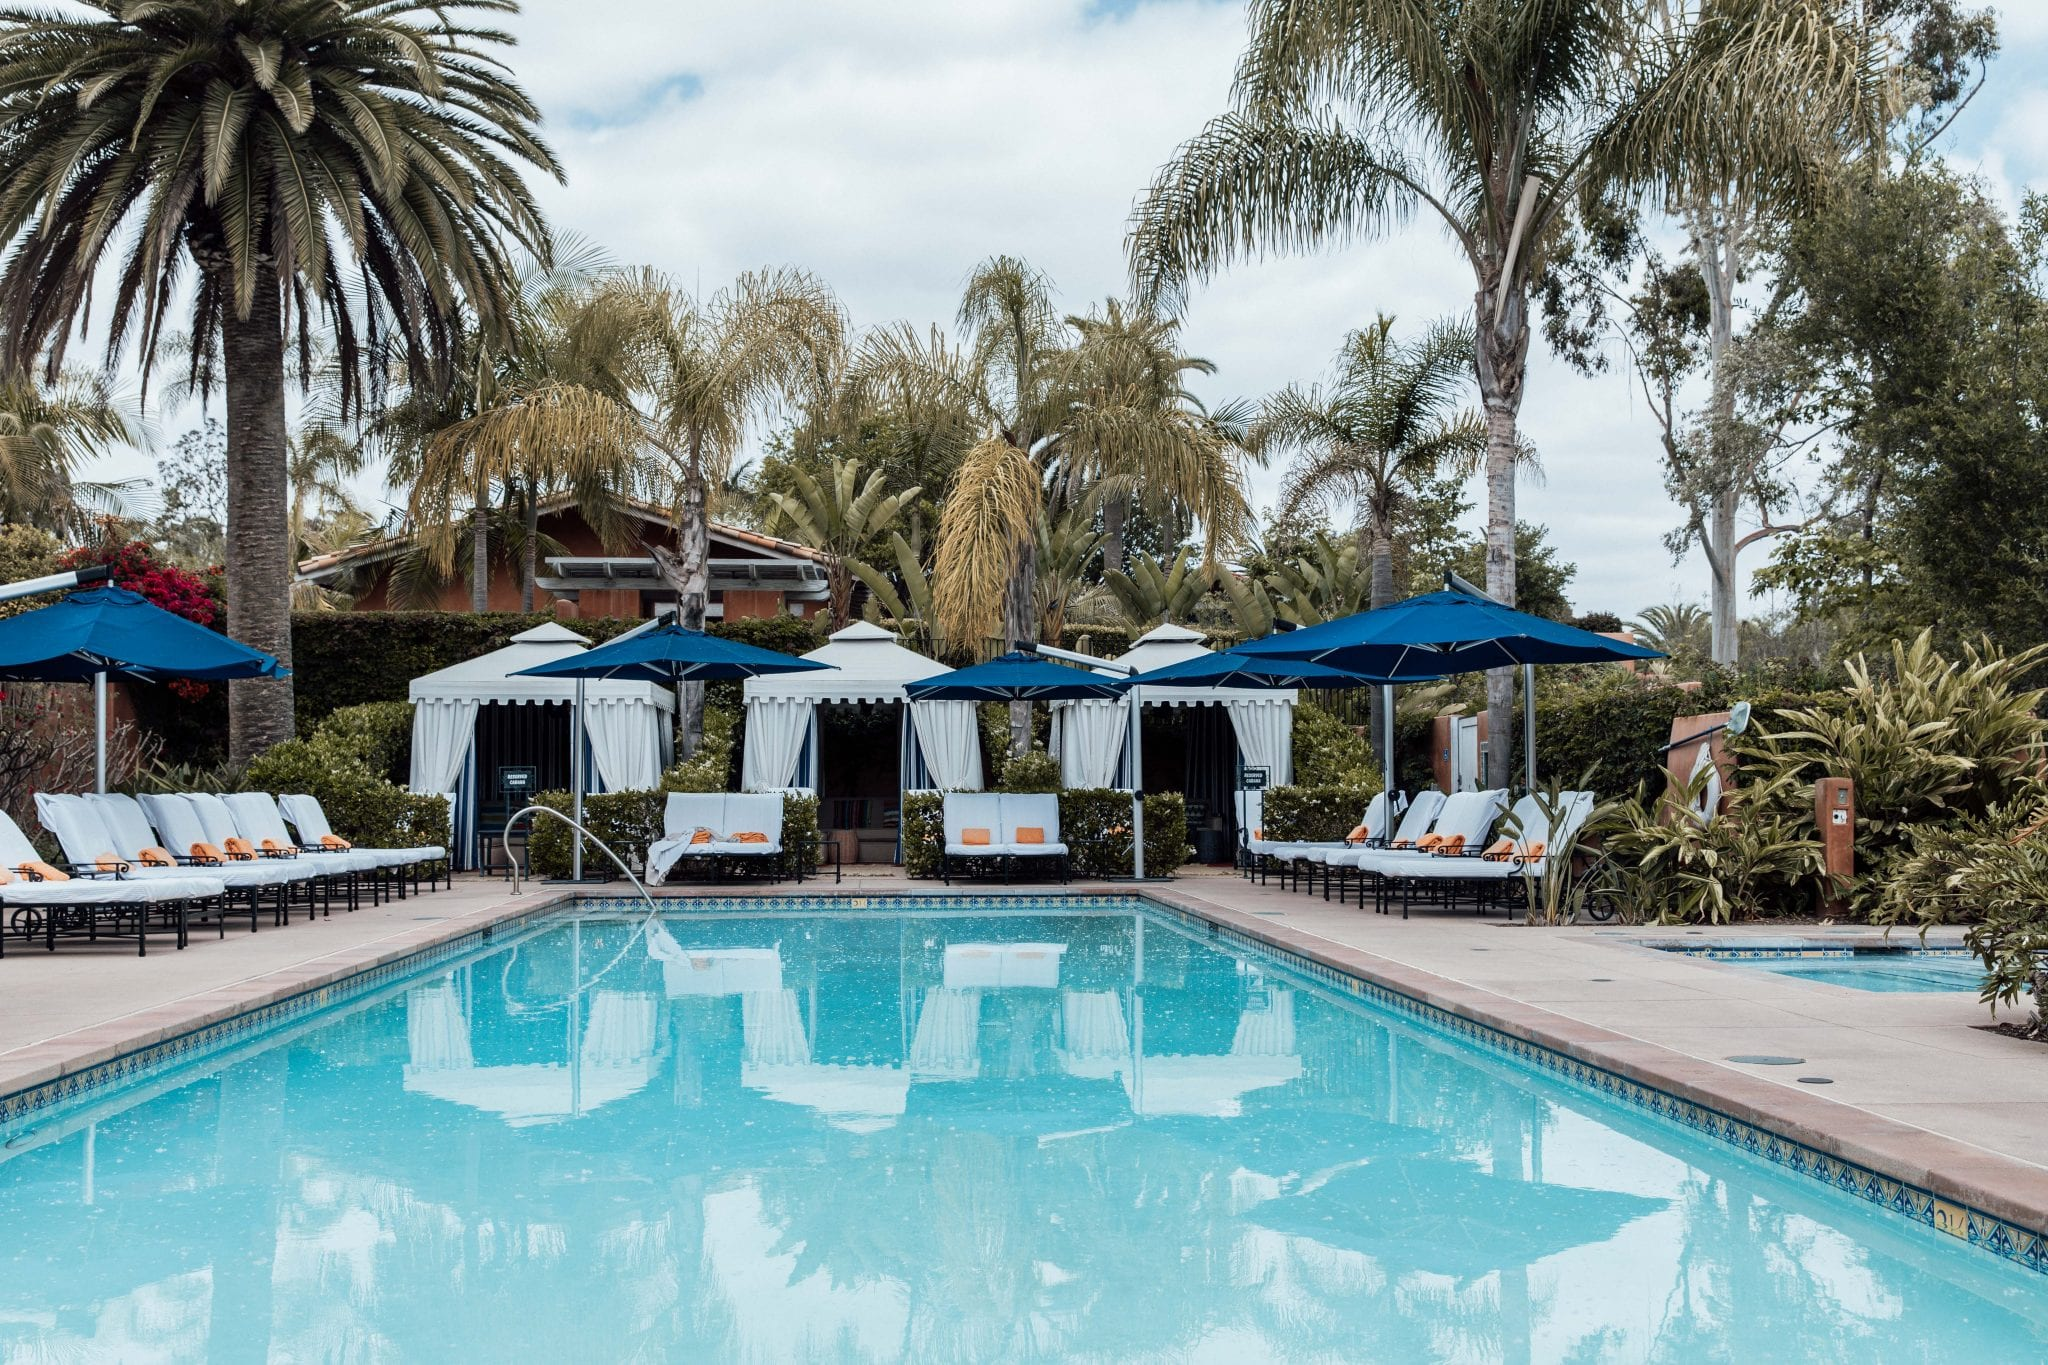 Rancho Valencia, pool, relaxation, getaway, self-care